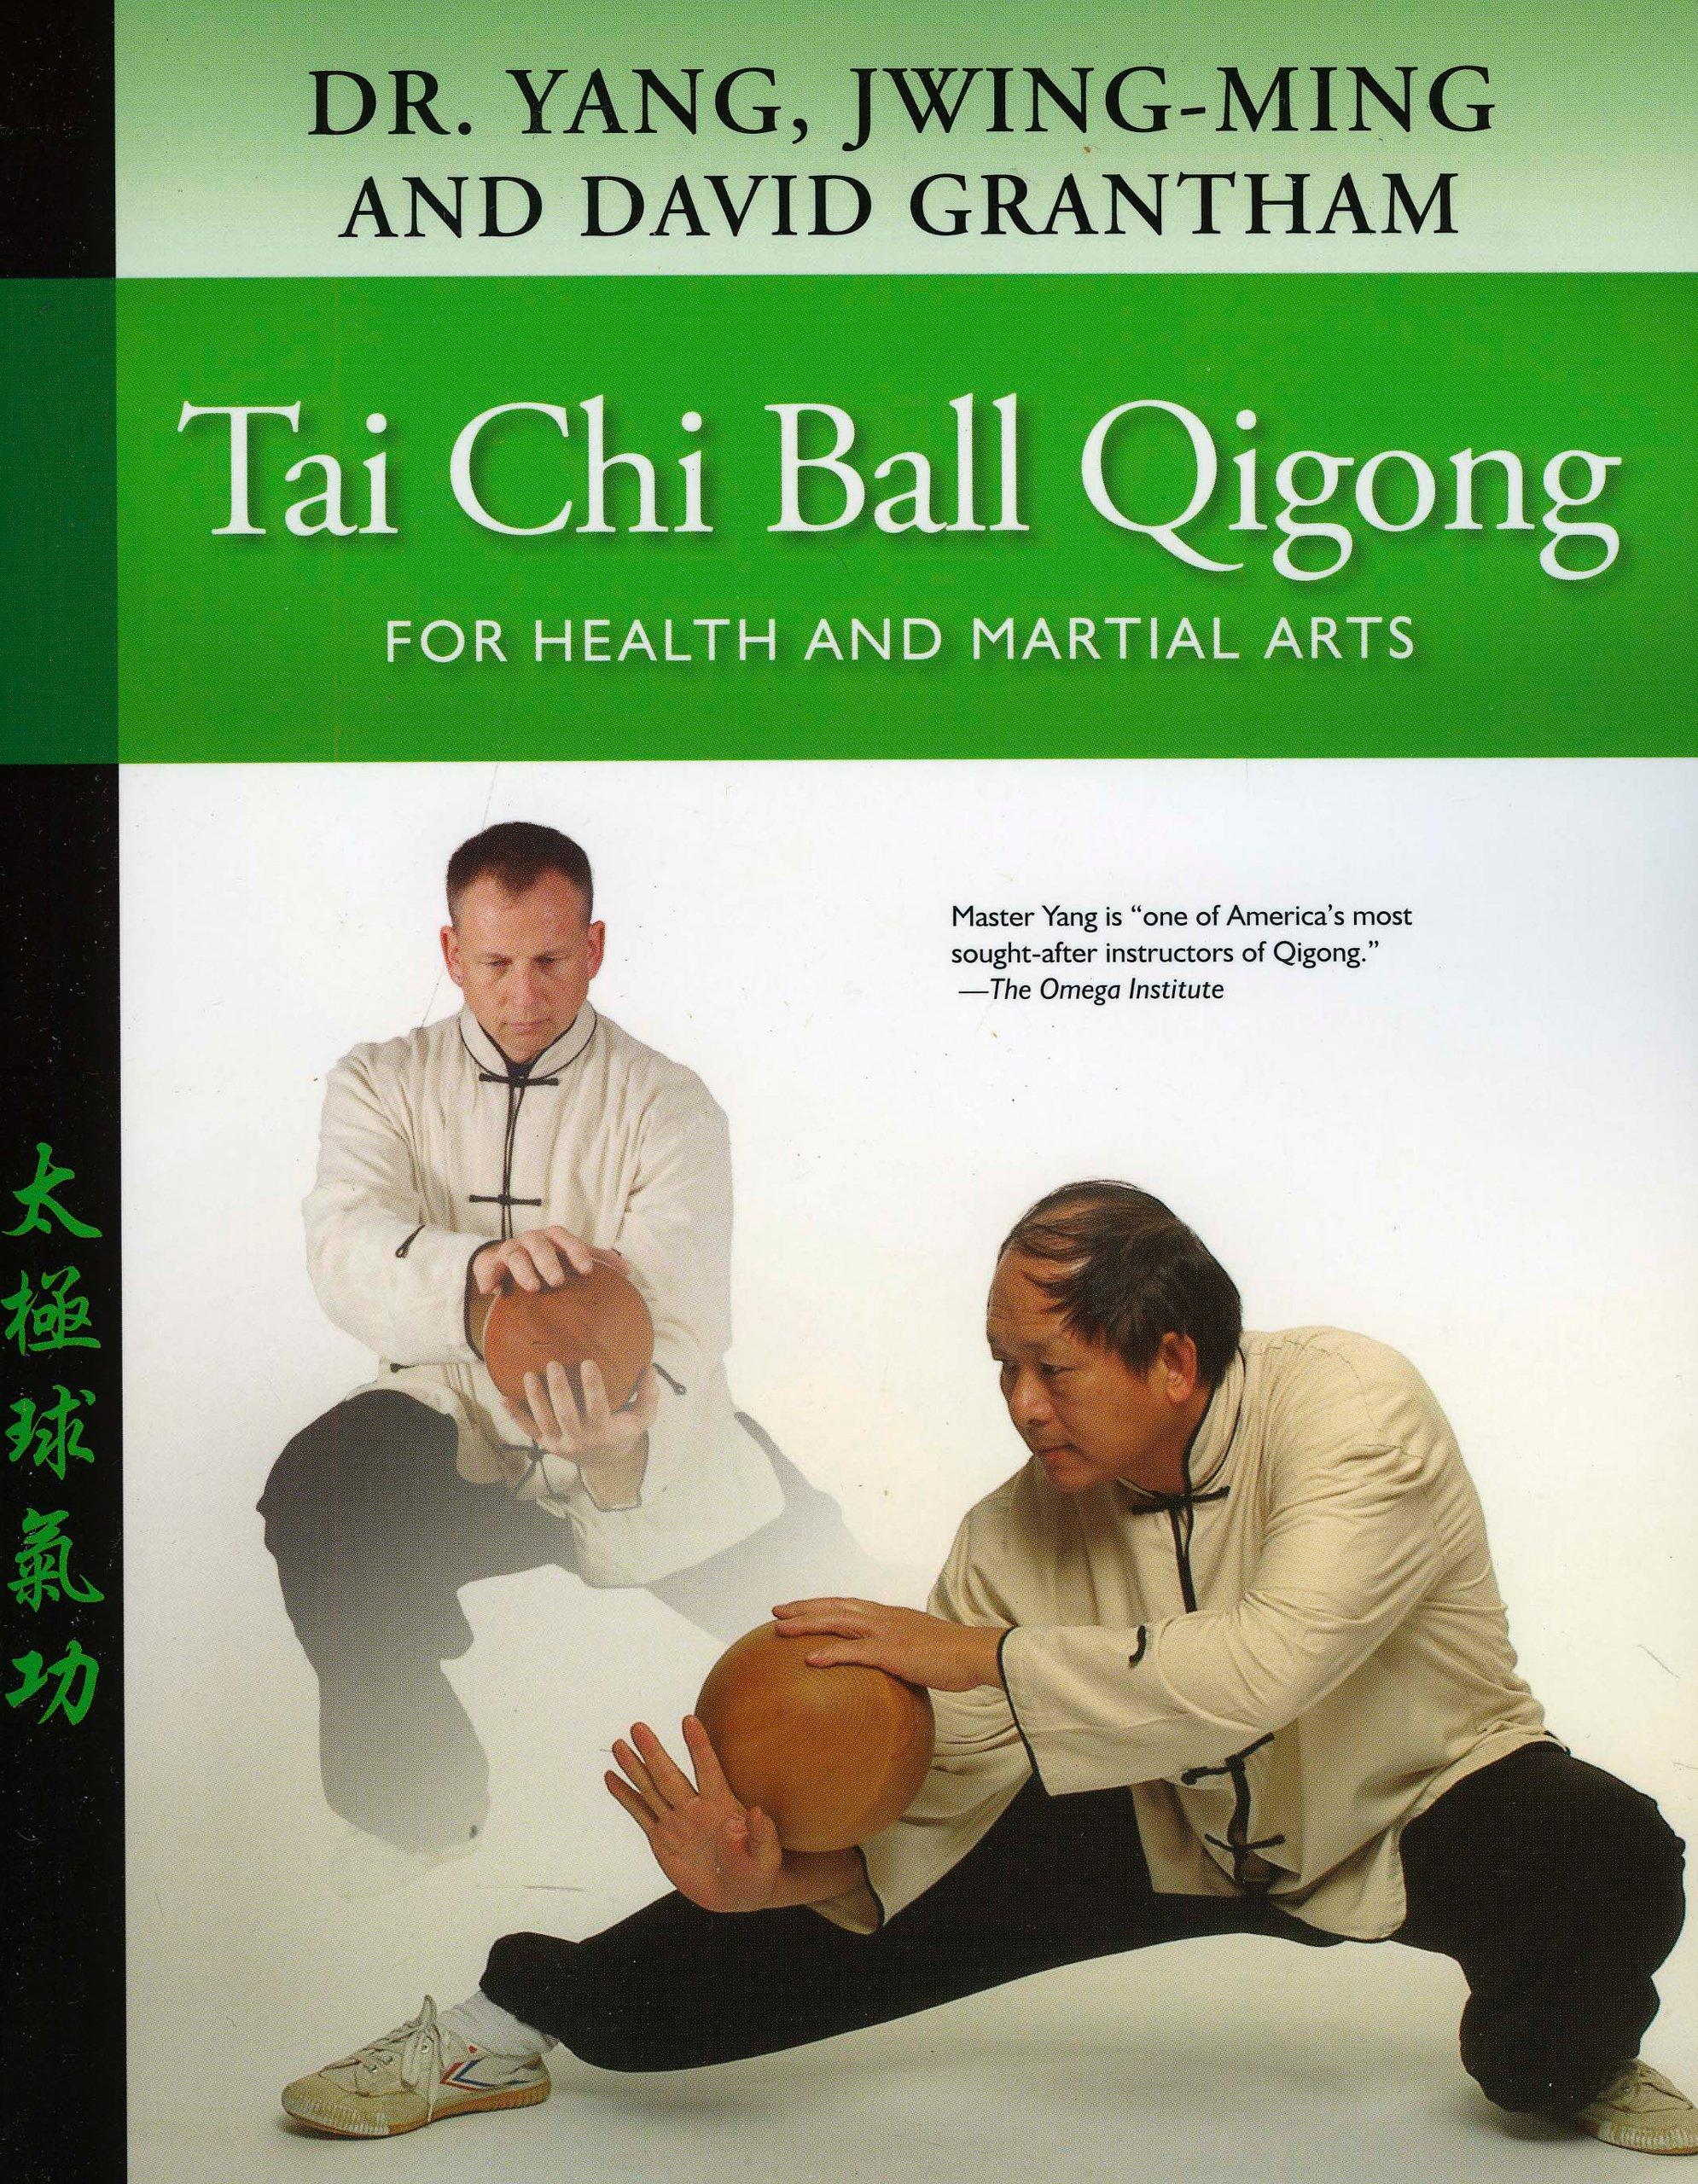 Tai Chi Ball Qigong: For Health and Martial Arts